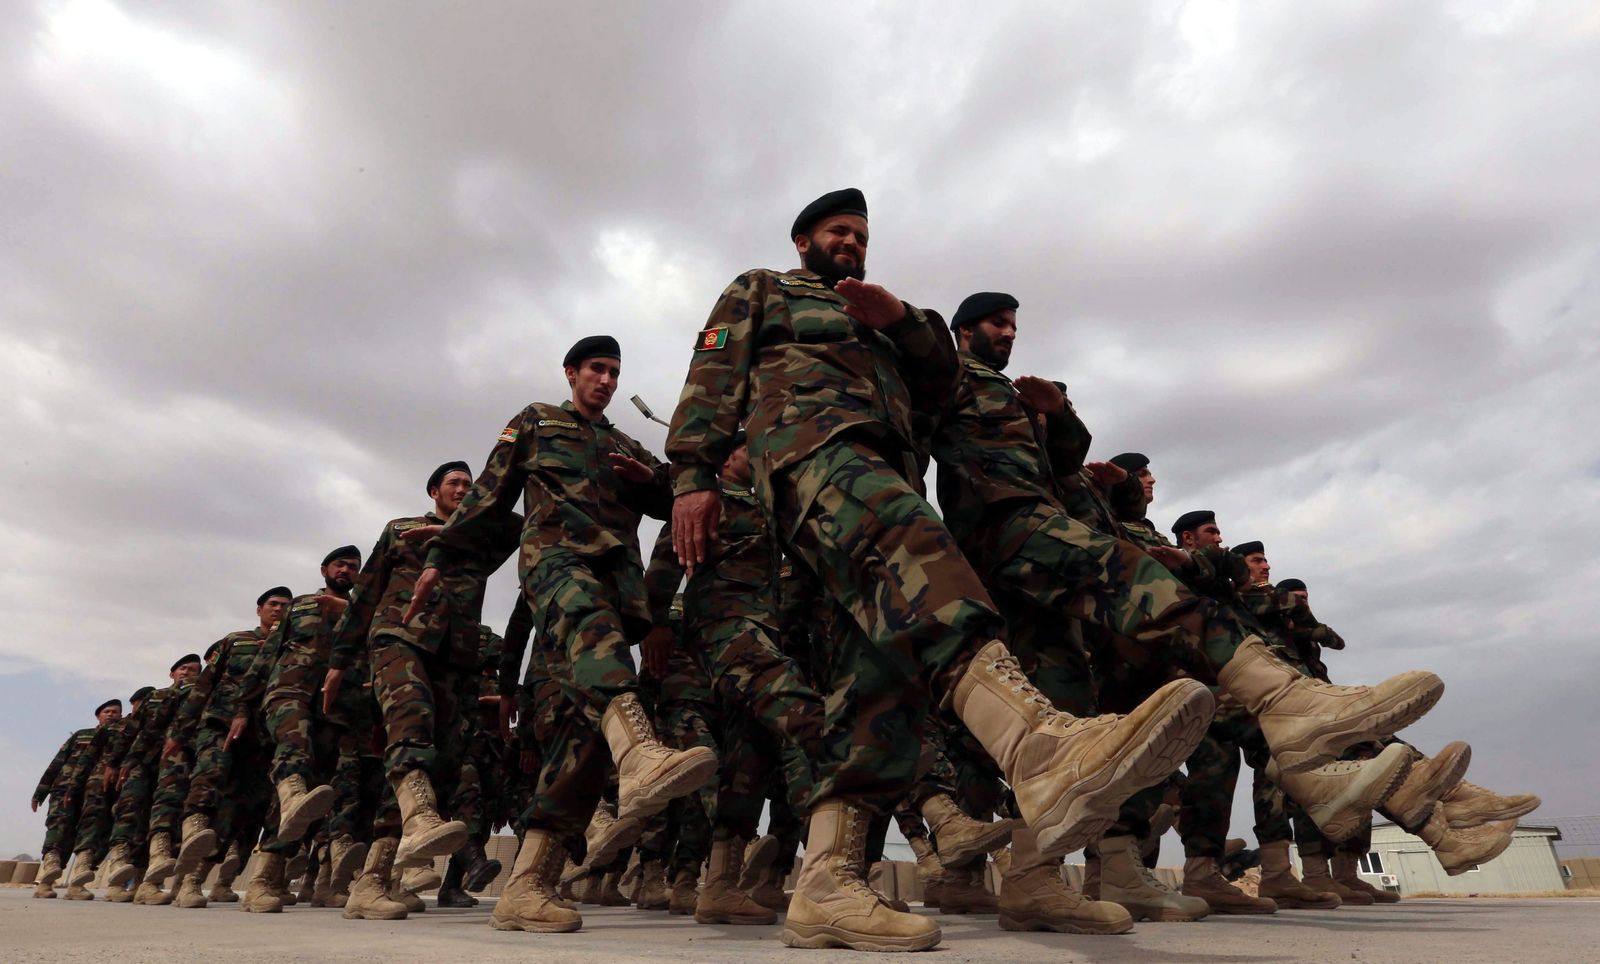 Afghanistan / Soldaten / Ausbildung